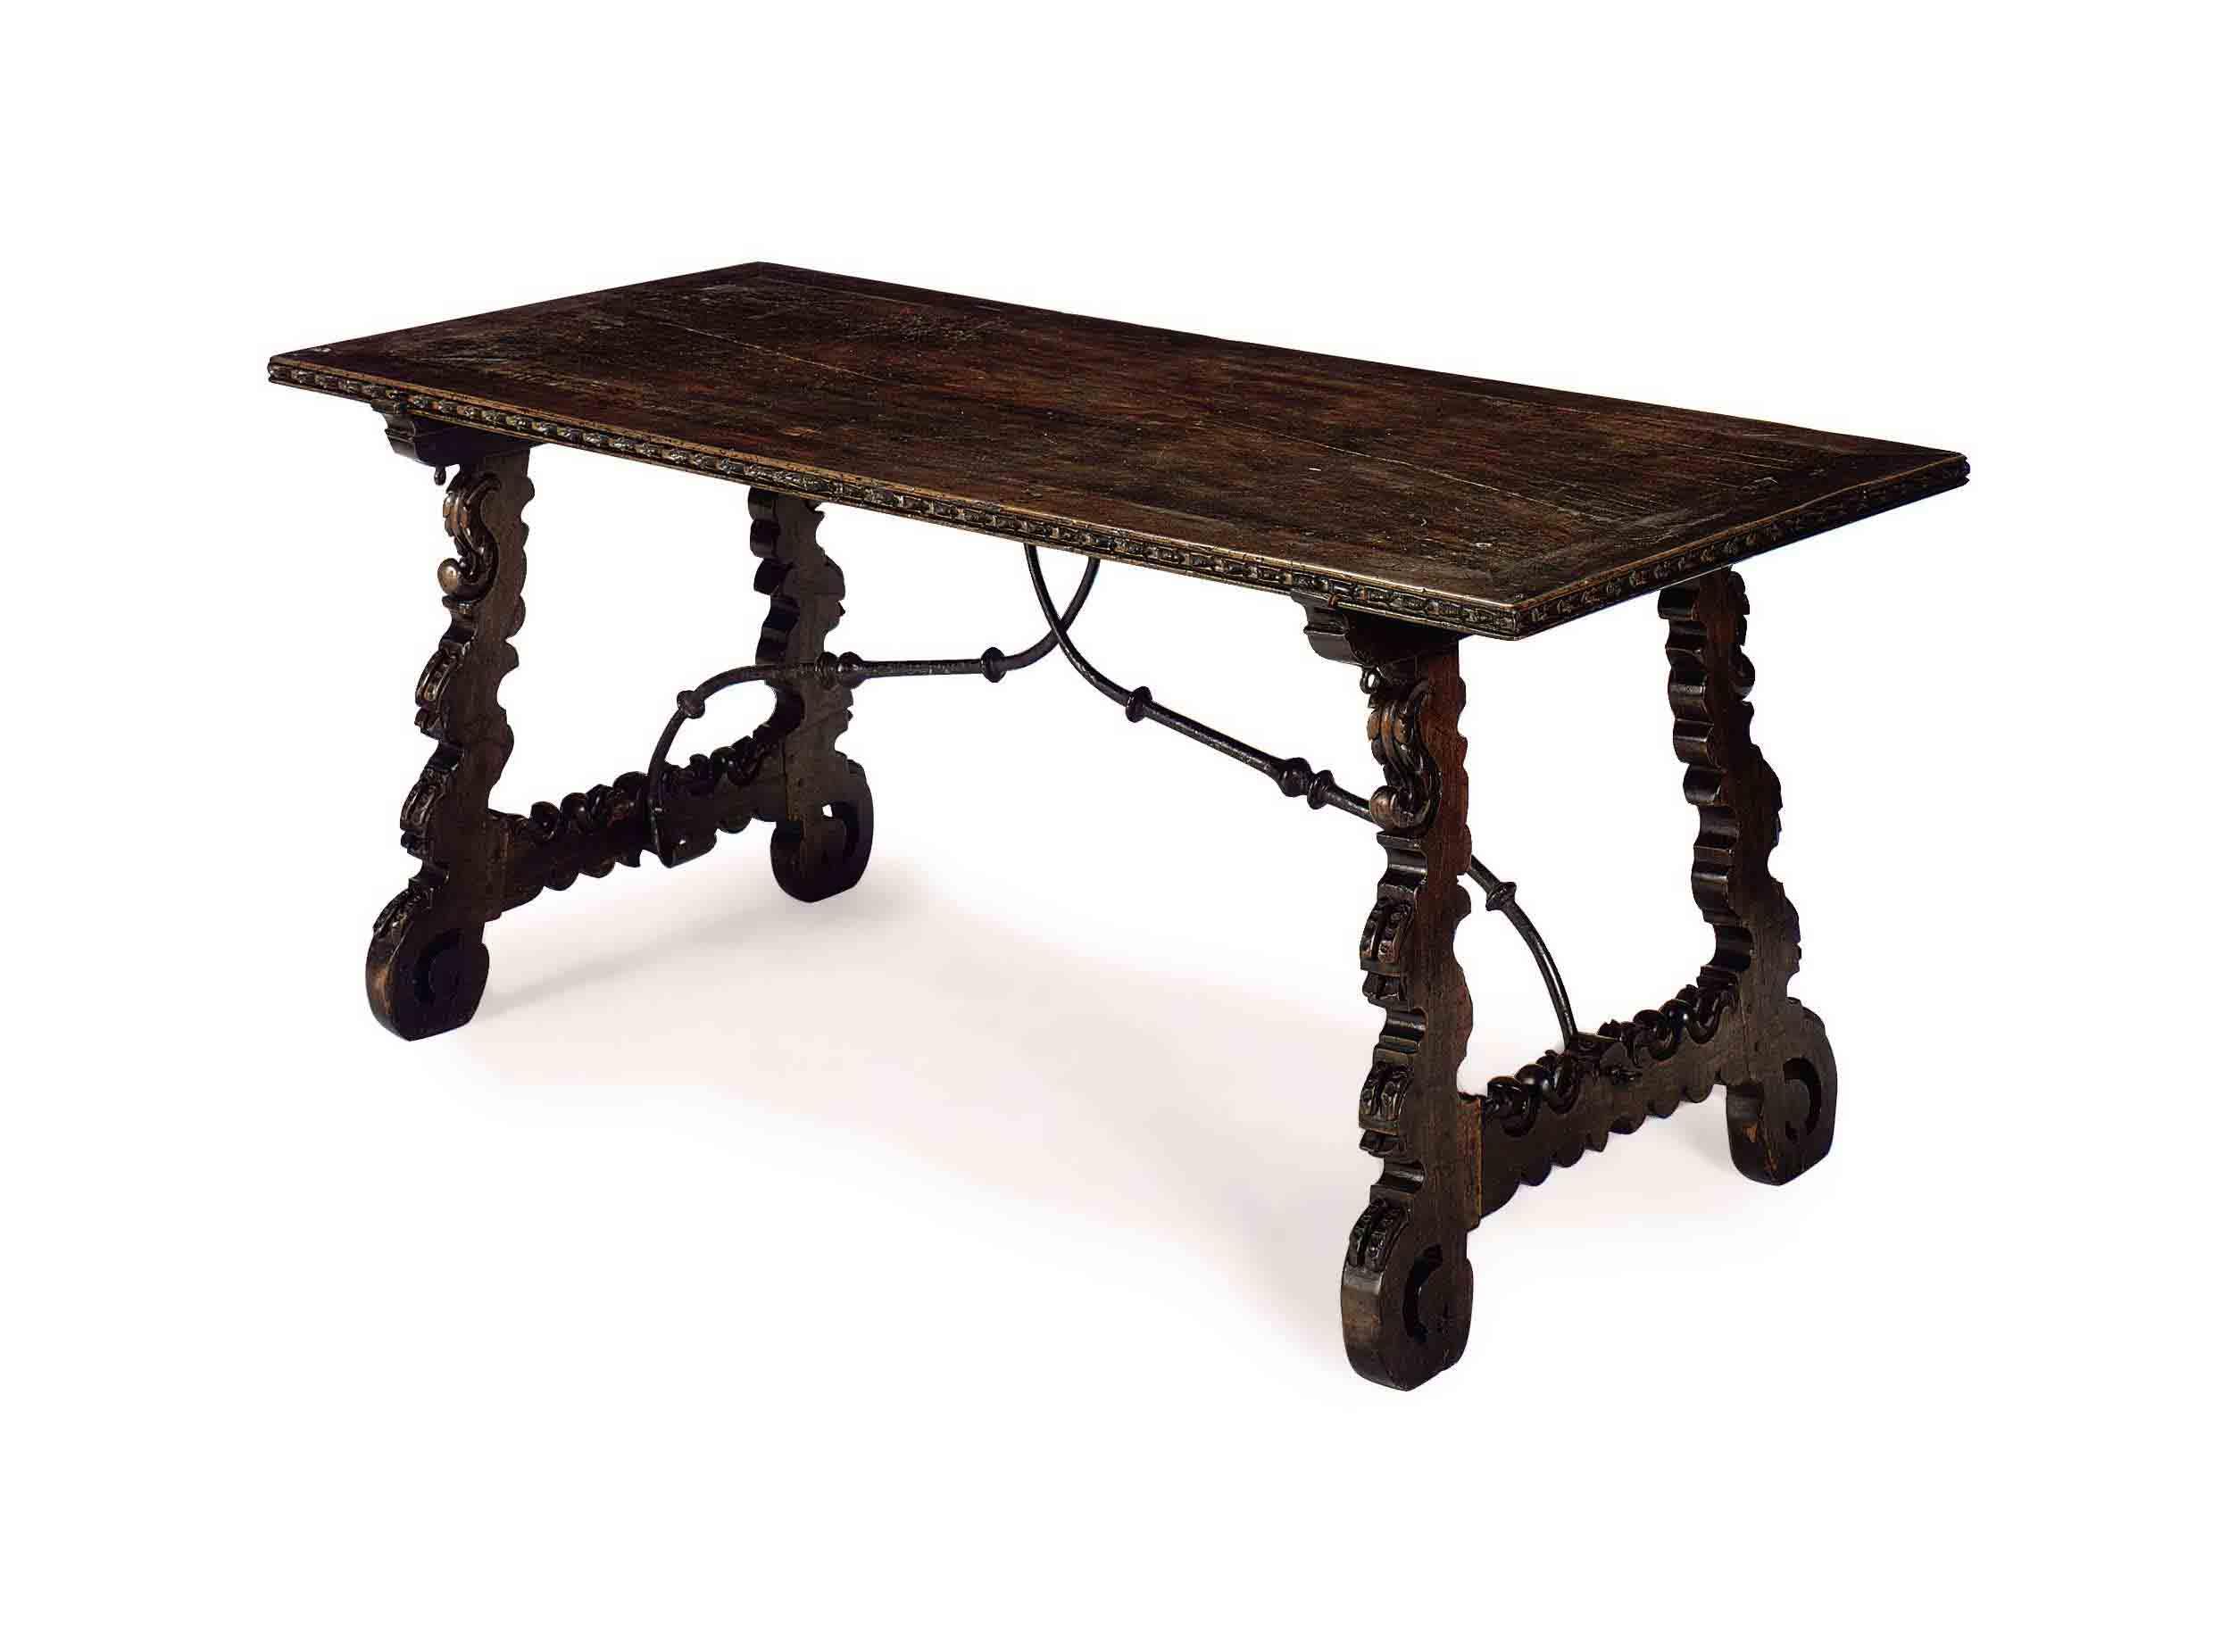 A CONTINENTAL OAK TAVERN TABLE